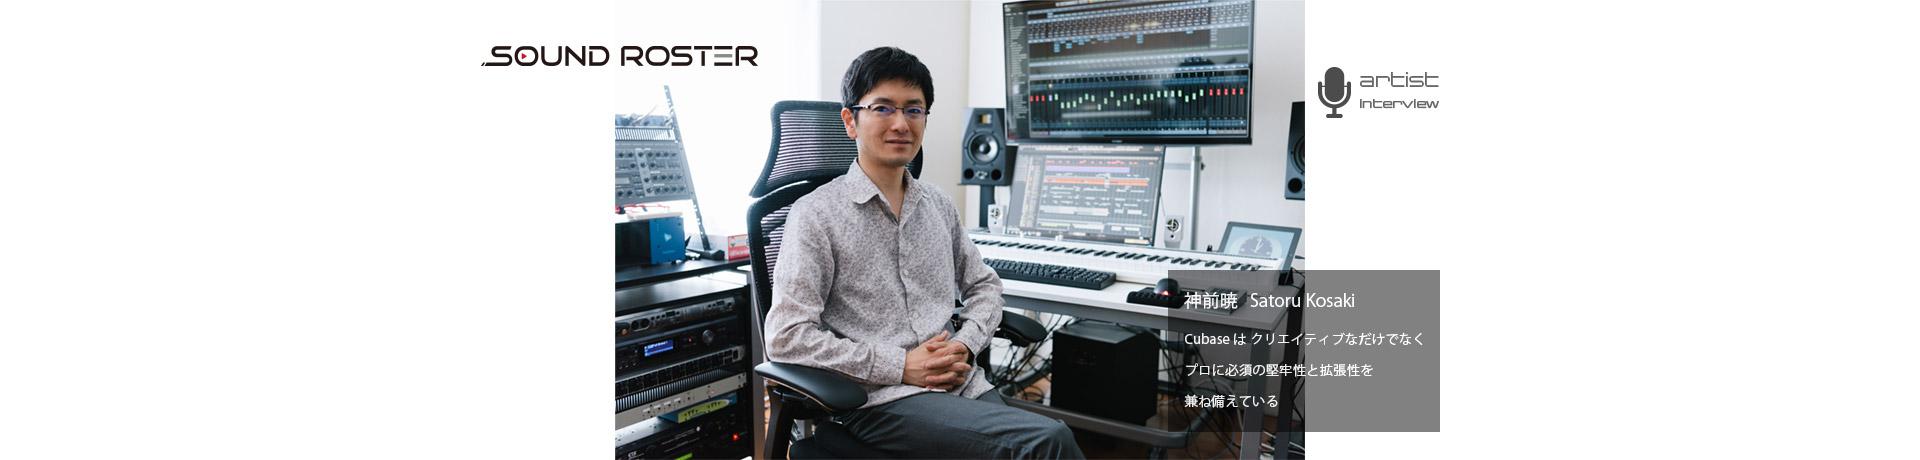 Steinberg Media Technologies GmbH大学時代のサークル活動で、本格的な作曲活動をはじめプロの道へ現場で知った音楽の奥深さとプロとして必要とされるスキルCubase は作曲ツールとして欠かせない、常に自分の傍らにある存在神前 暁(Satoru Kosaki) - プロフィール告知情報・リリース情報